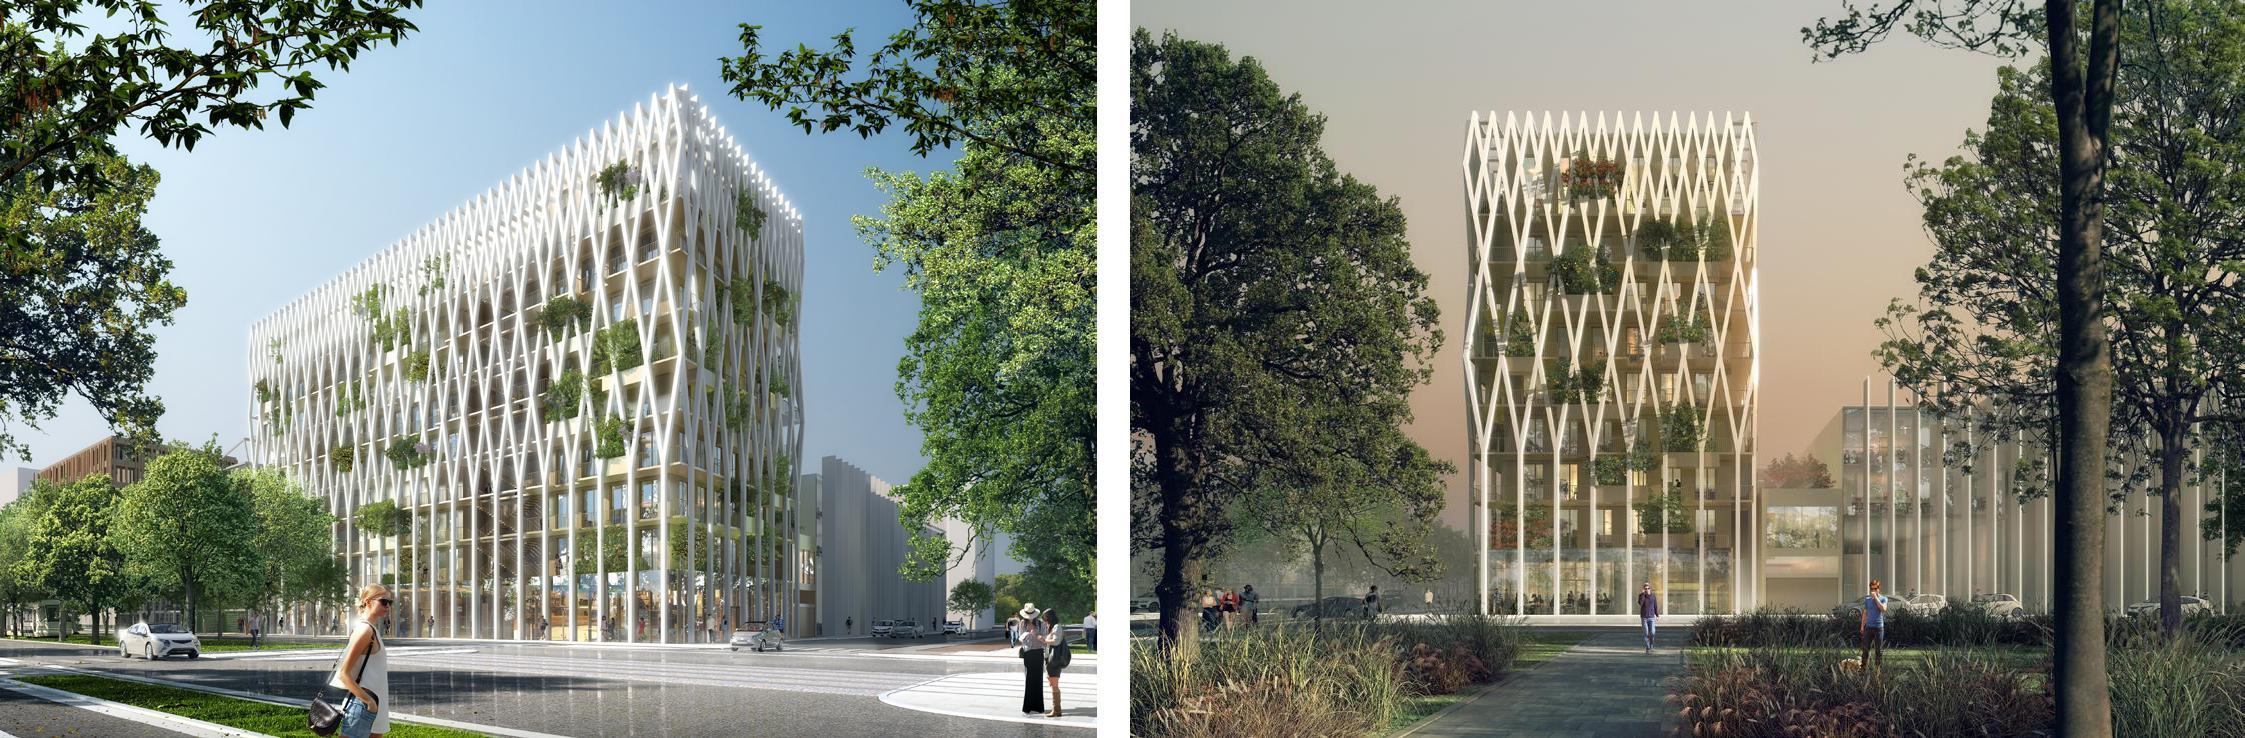 Architecte : Architecture-Studio / Maître d'ouvrage : Nexity Ywood / Aménageur : EPA / Paysagiste : Tangram